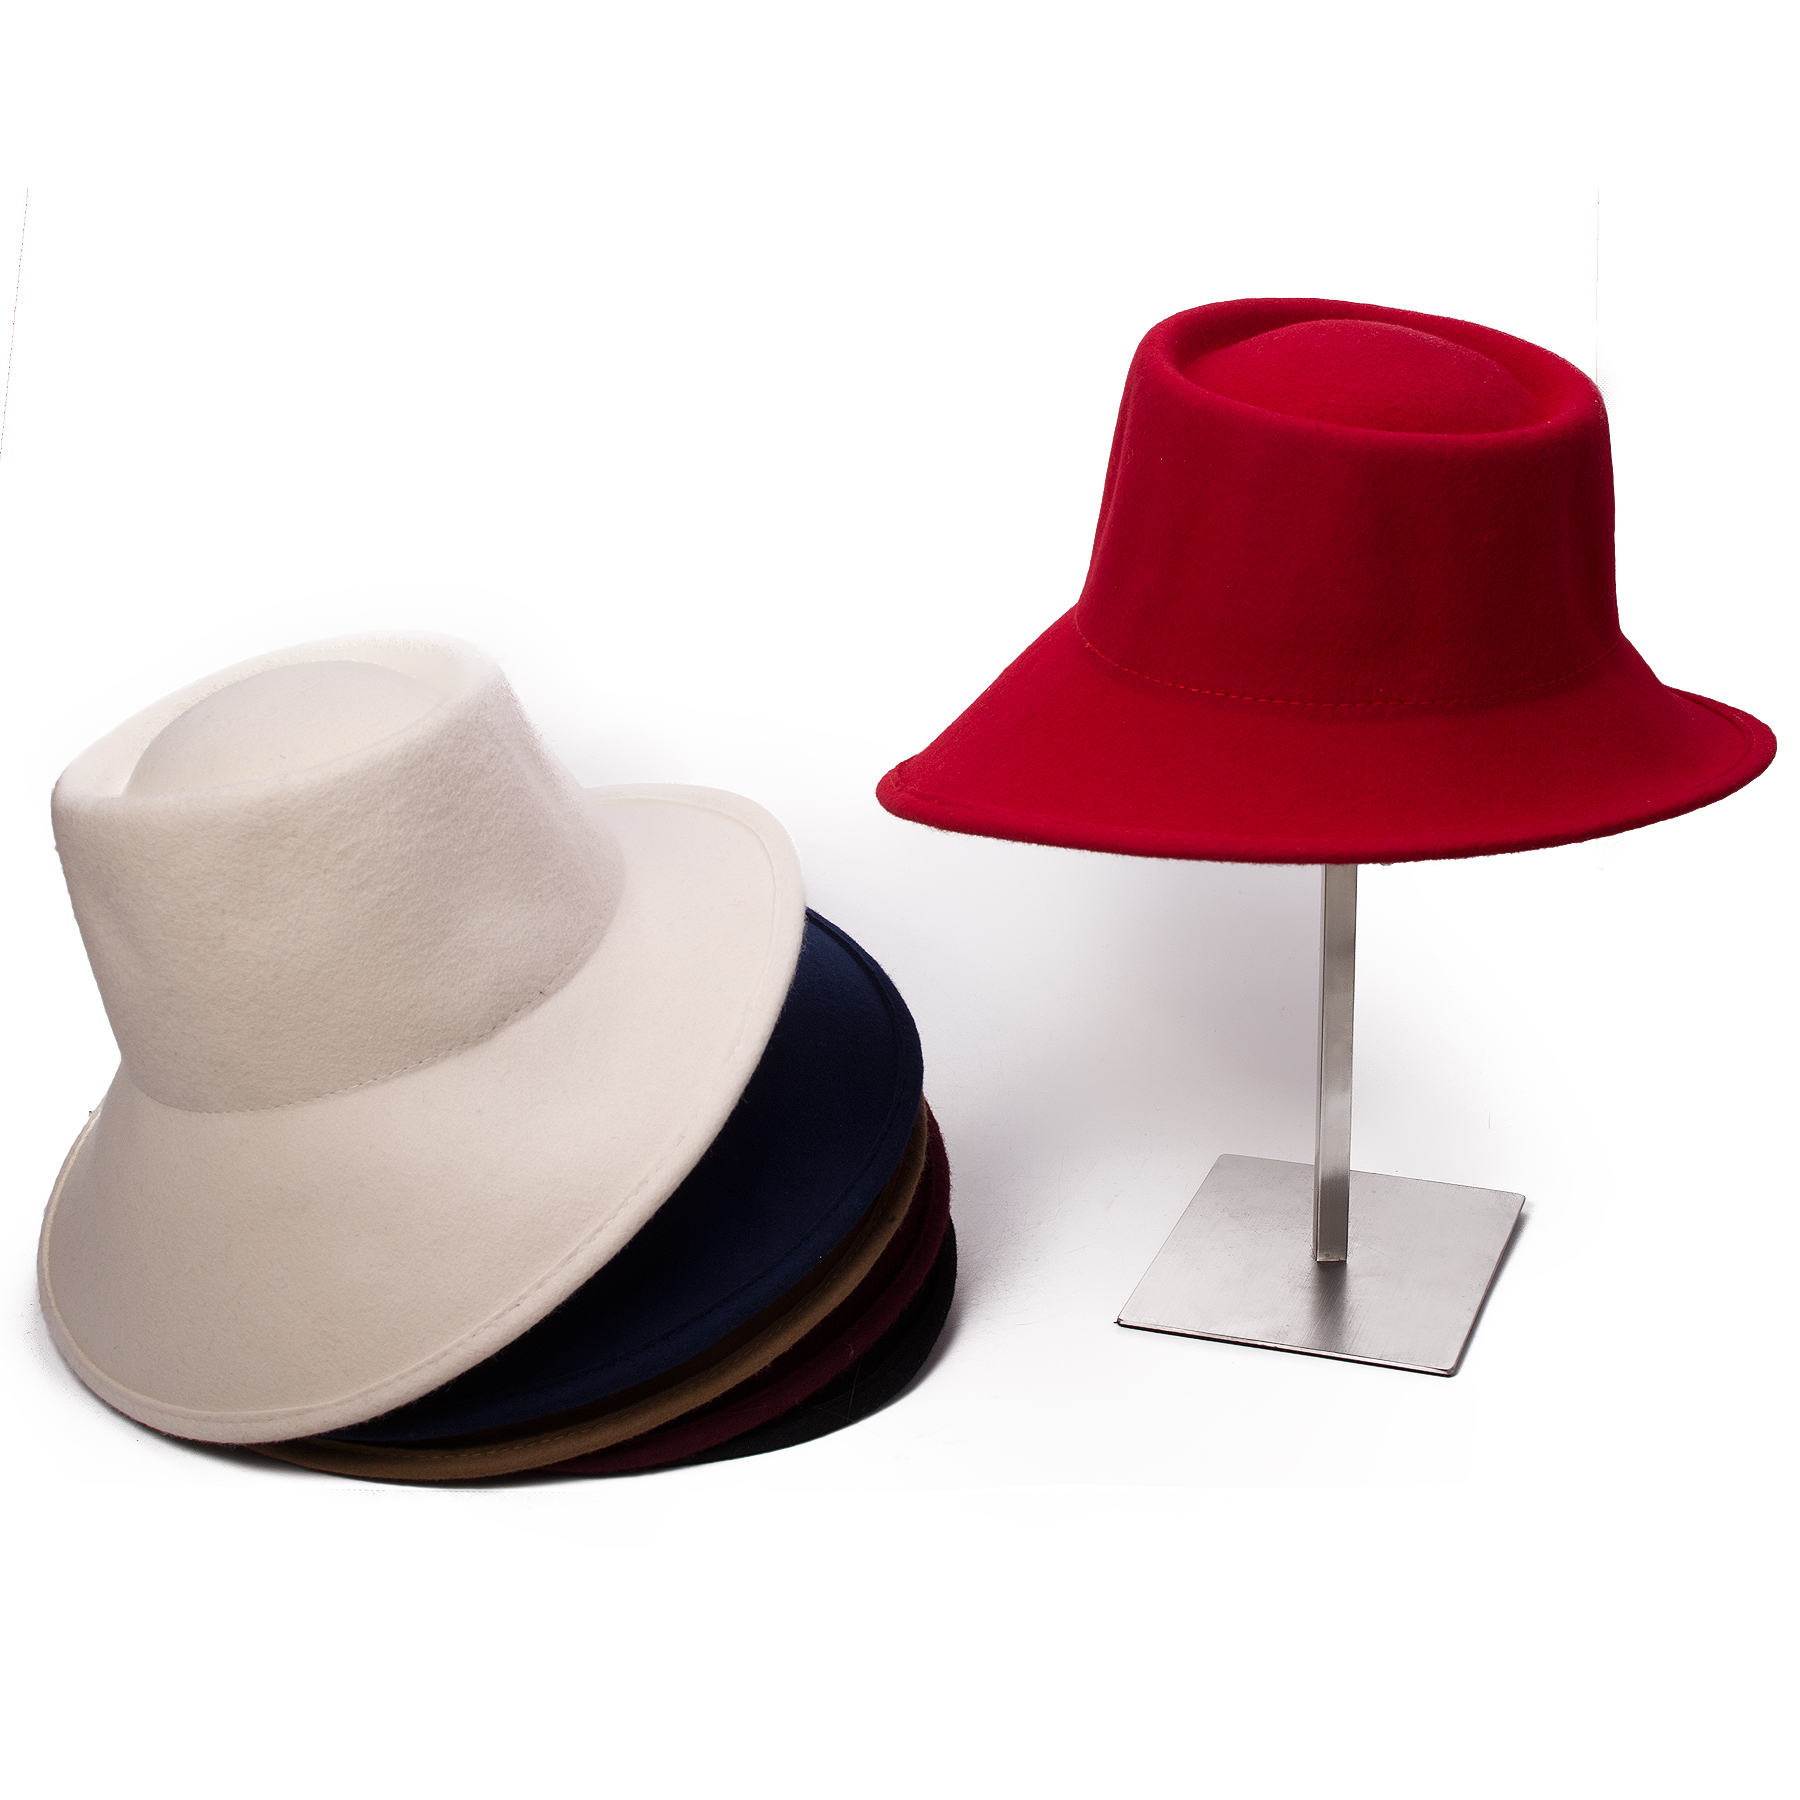 Lawliet 100% Wool Women Hat Wide Brim Fedora Special Floppy Women Felt Tilt Asymmetrical Brim Wedding Church Hat T289